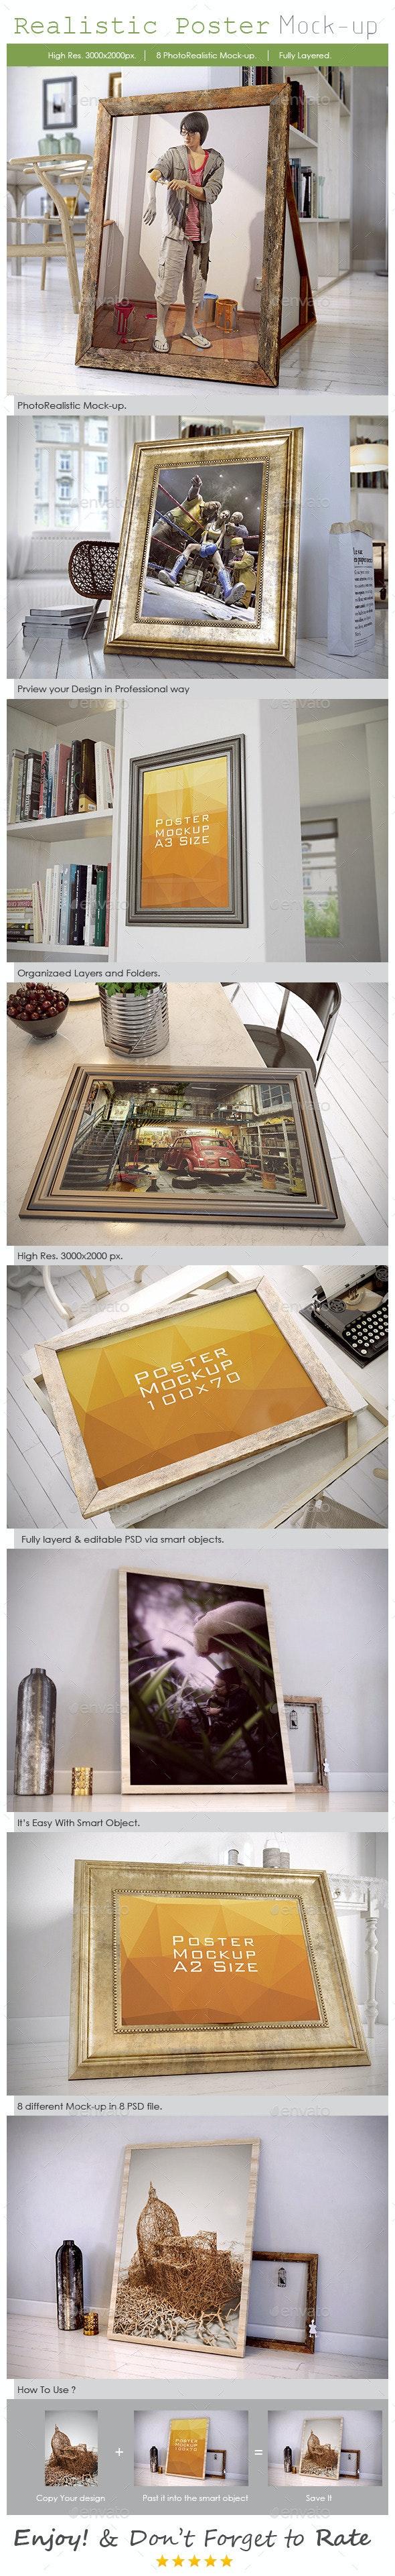 Realistic Poster Mockup - Posters Print